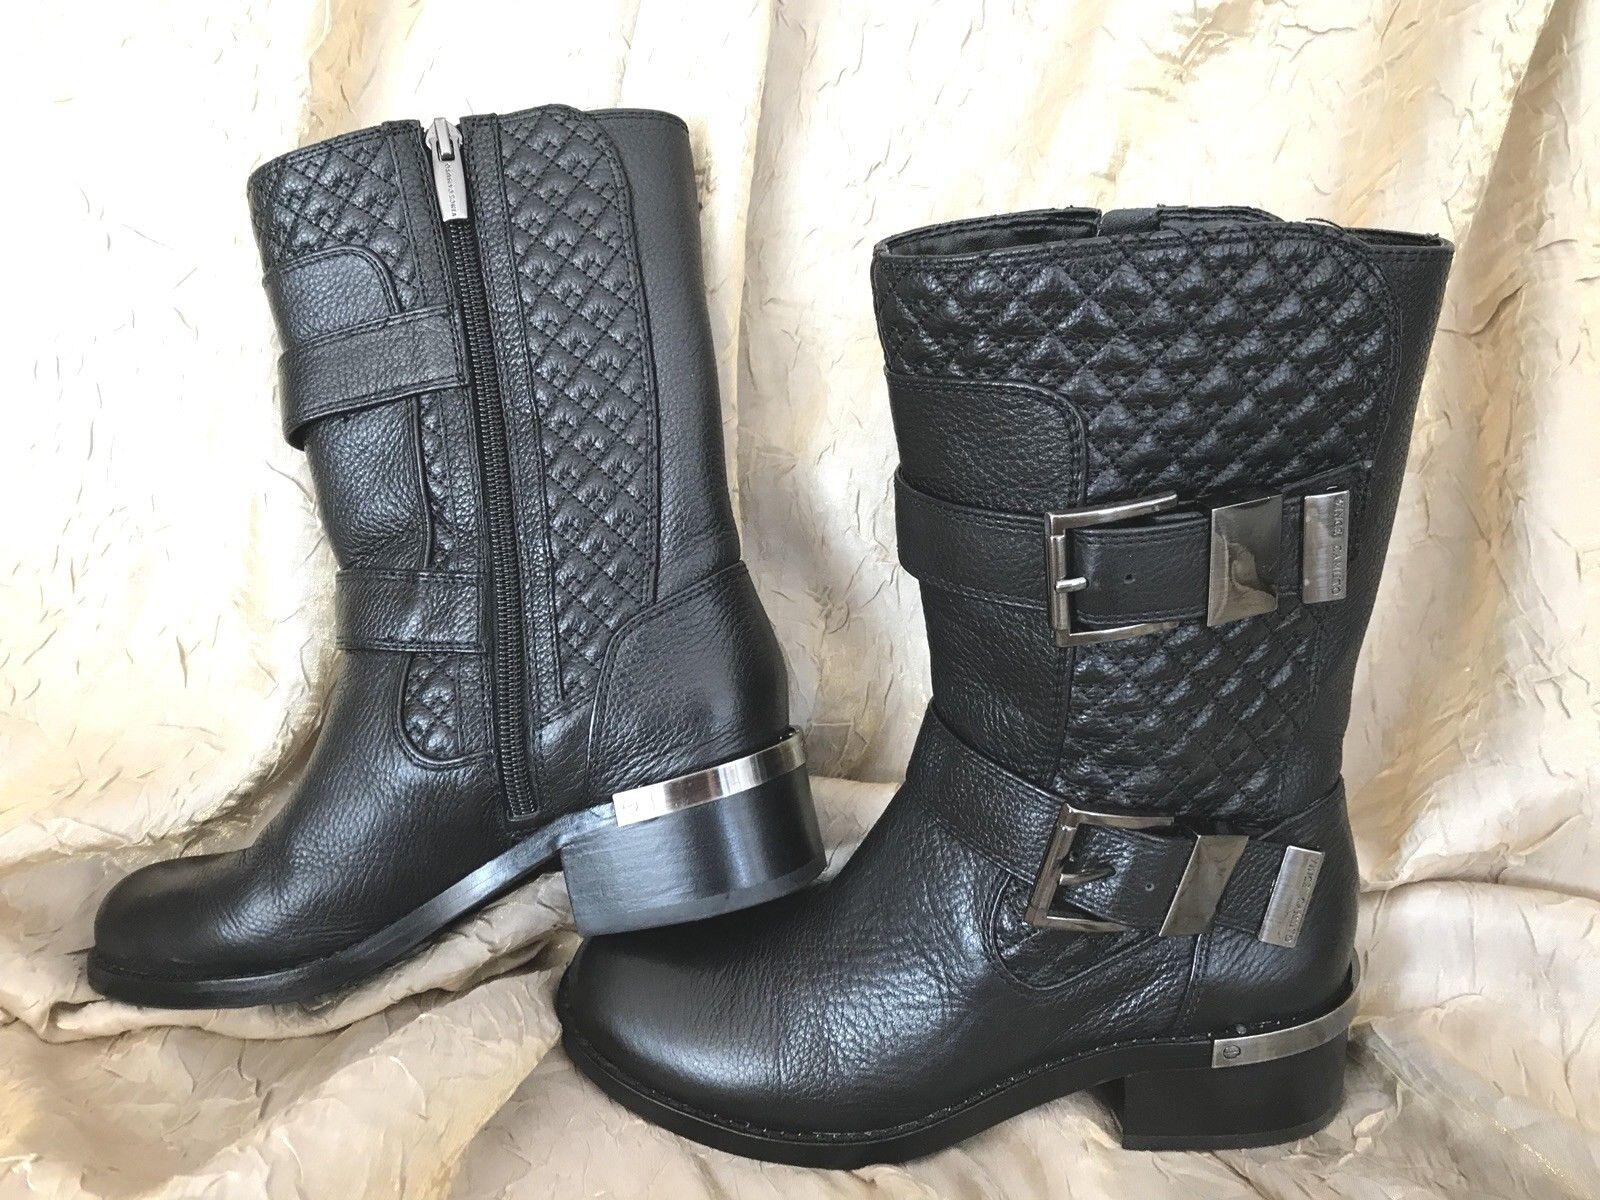 acquista la qualità autentica al 100% Vince Vince Vince CamutoWeltonMed-HeightneroLeatherQuilted Motostivali scarpe donna 5M  Miglior prezzo